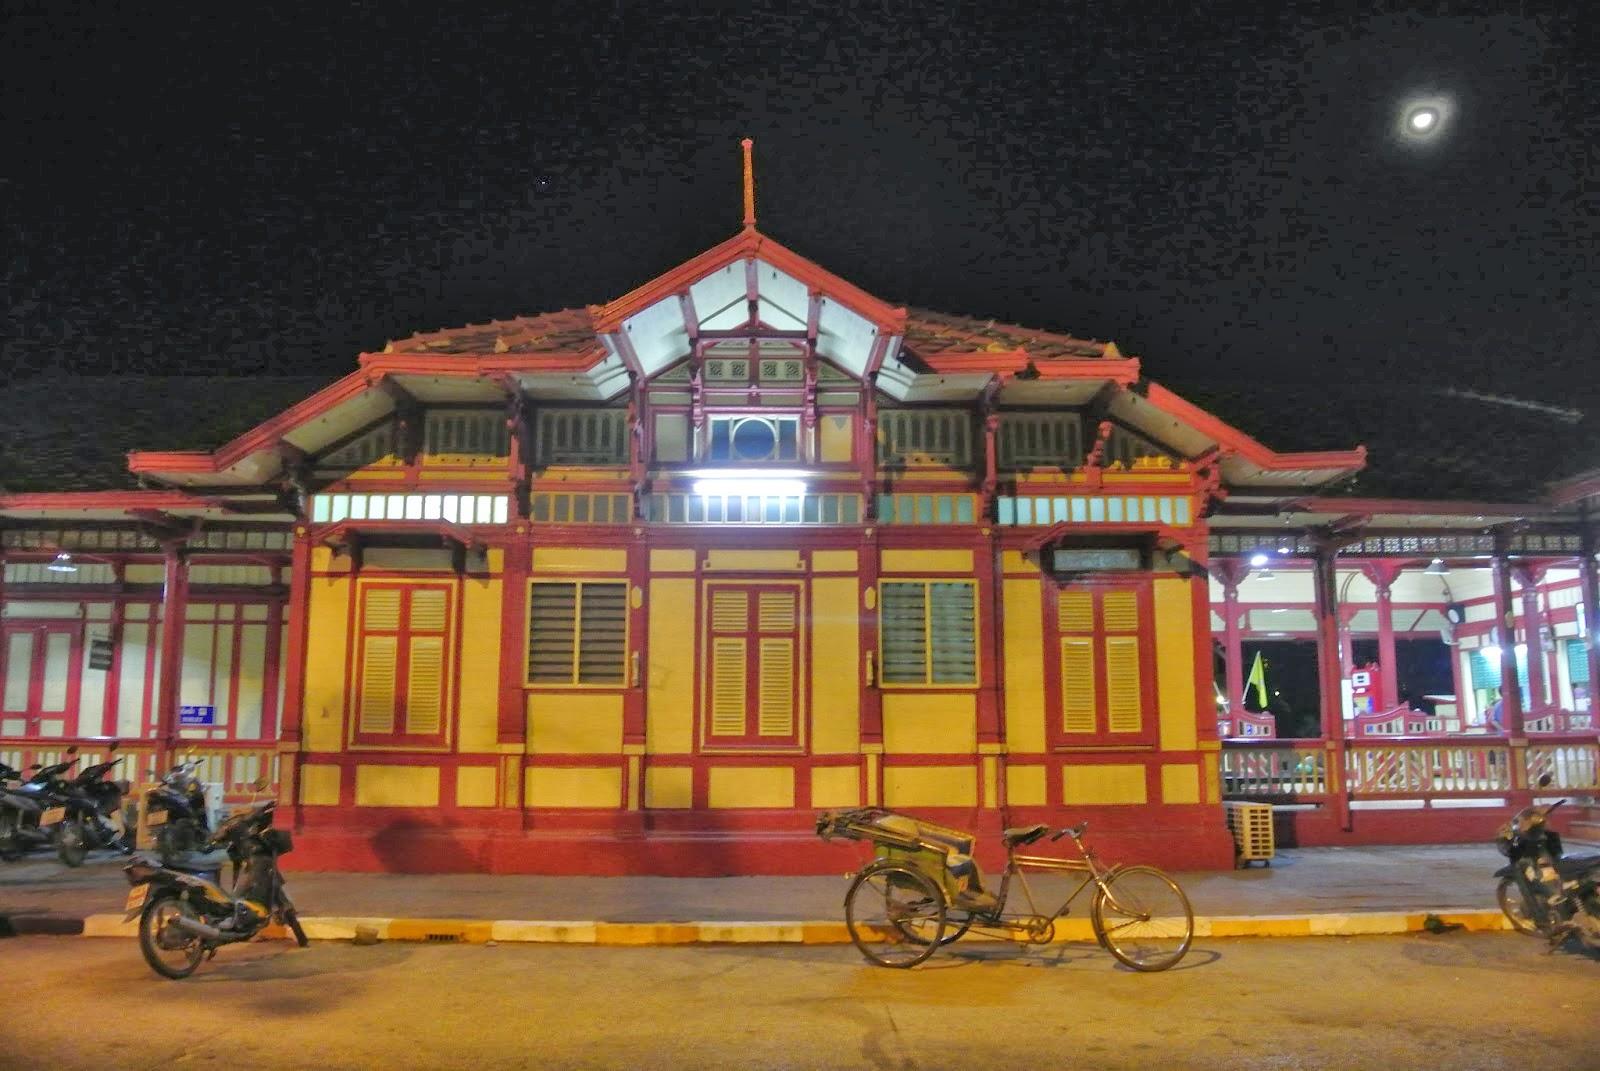 Bahnhof Hua Hin bei Nacht